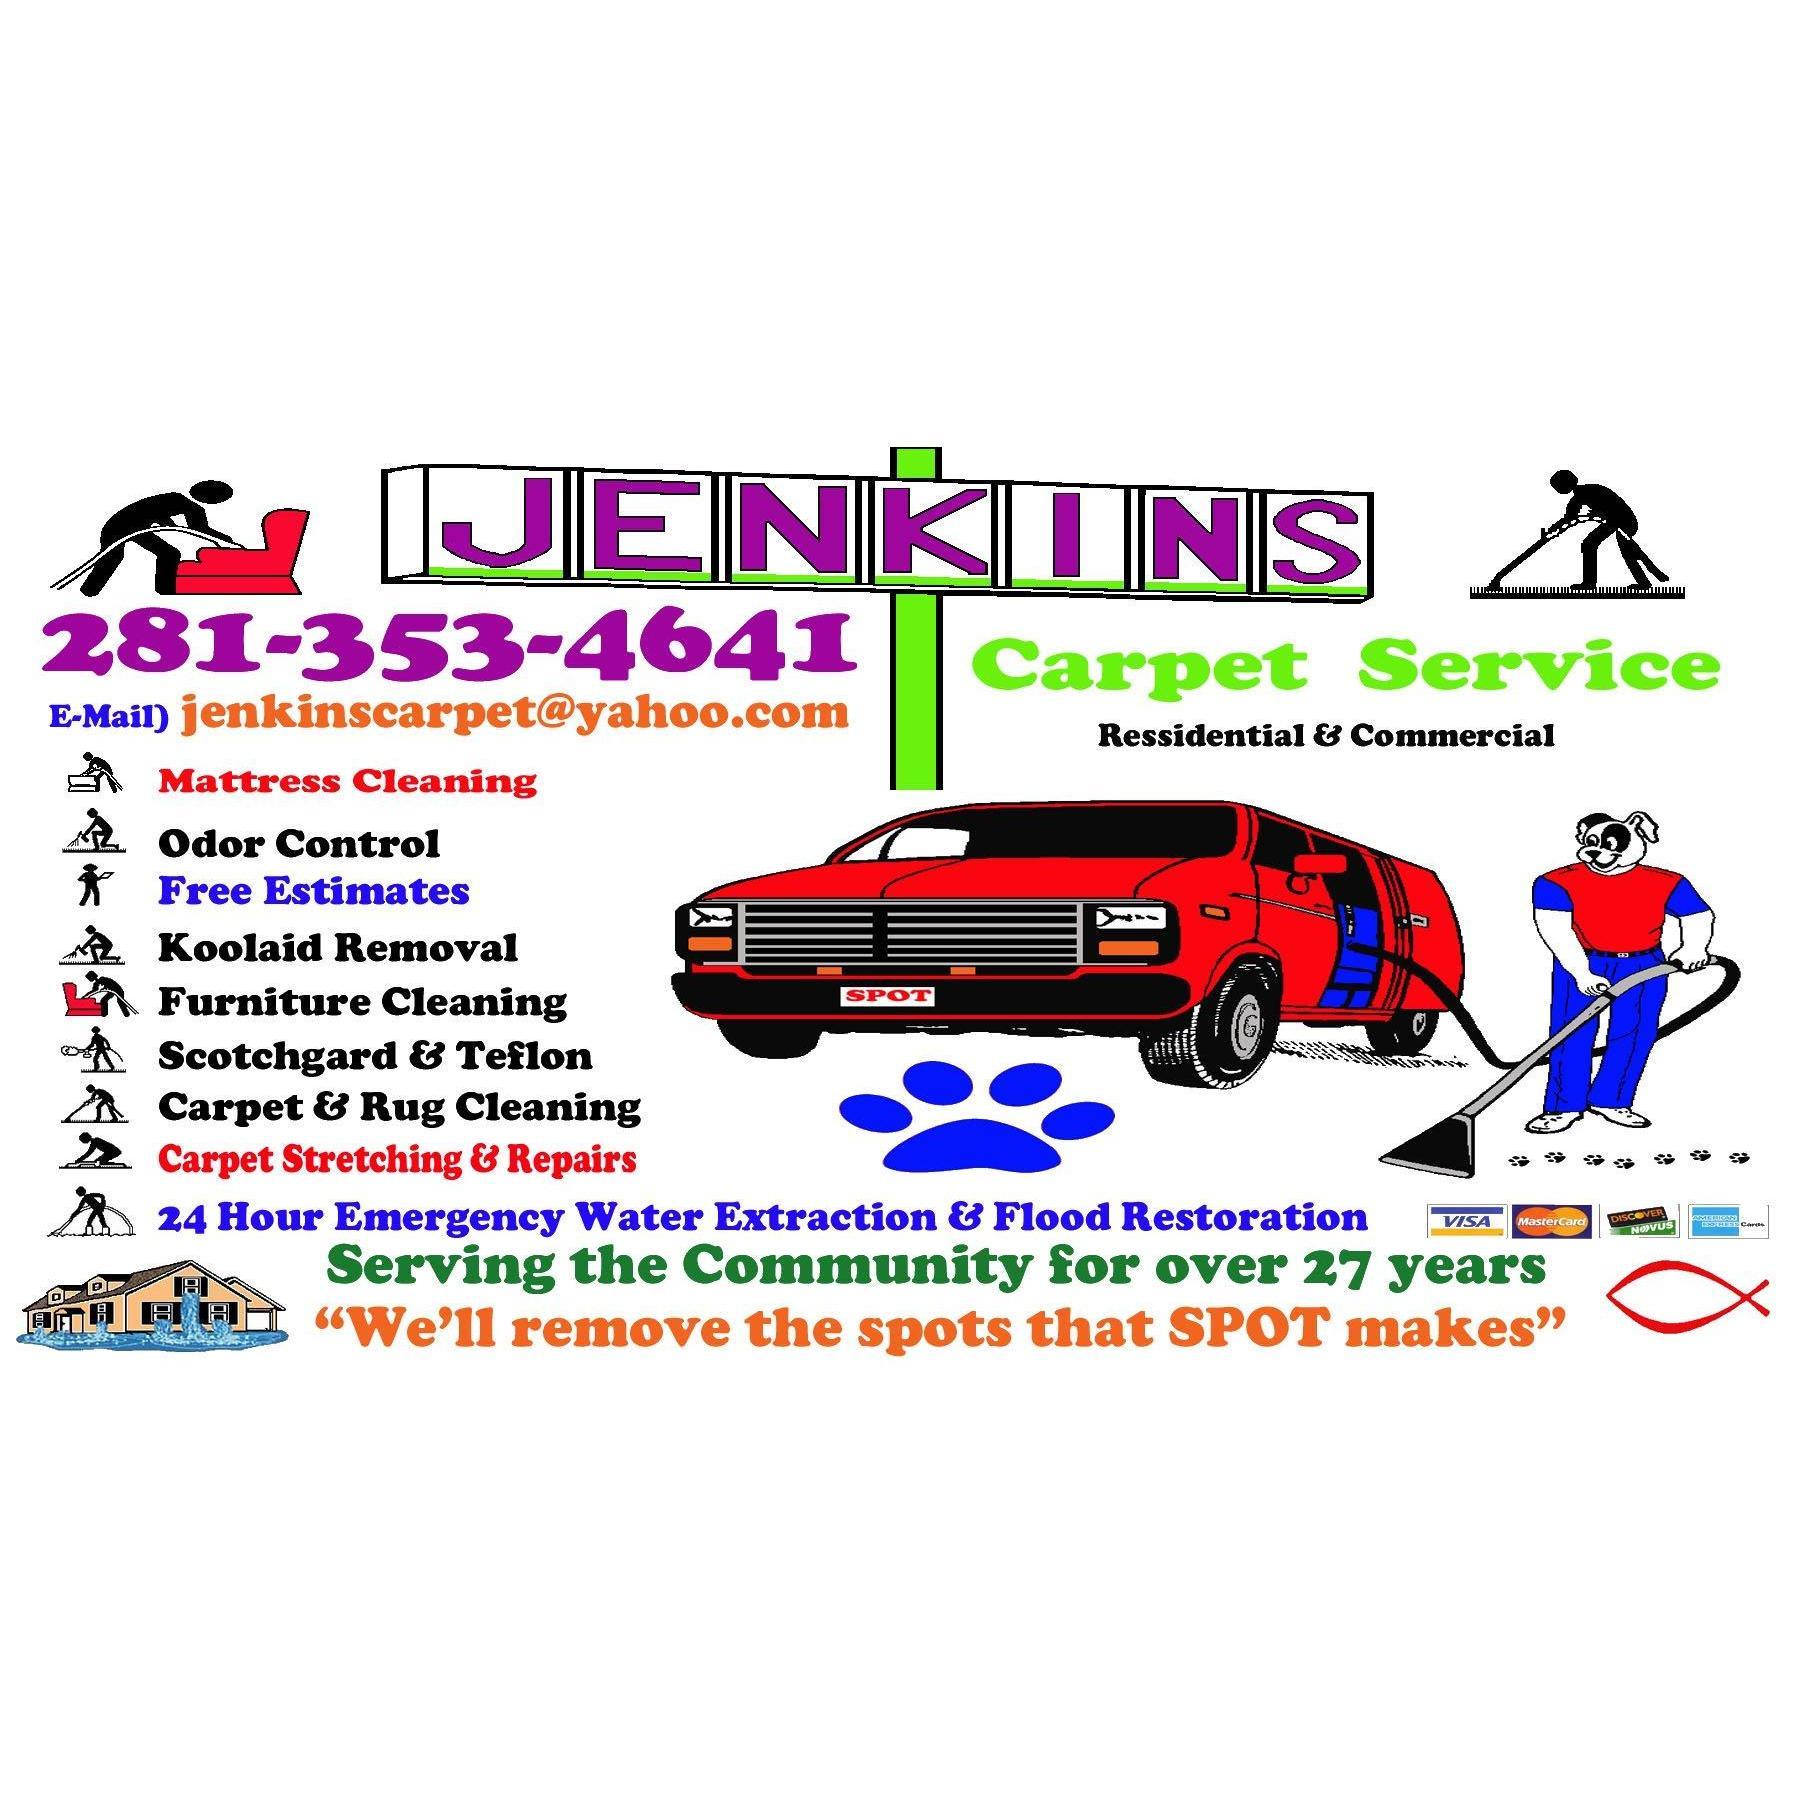 Jenkins Carpet Service